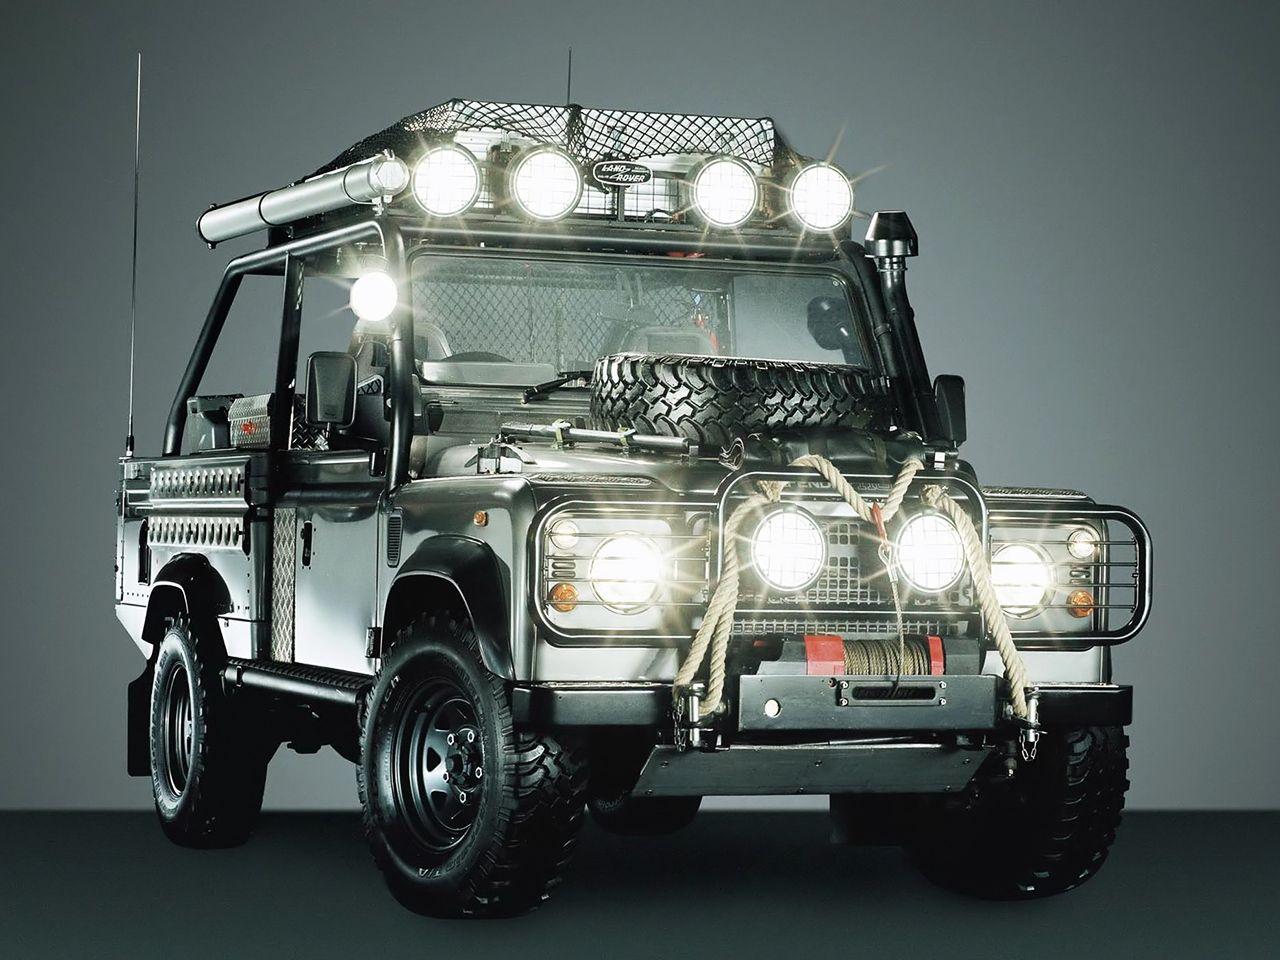 Land Rover Defender 90 Tomb Raider 2001